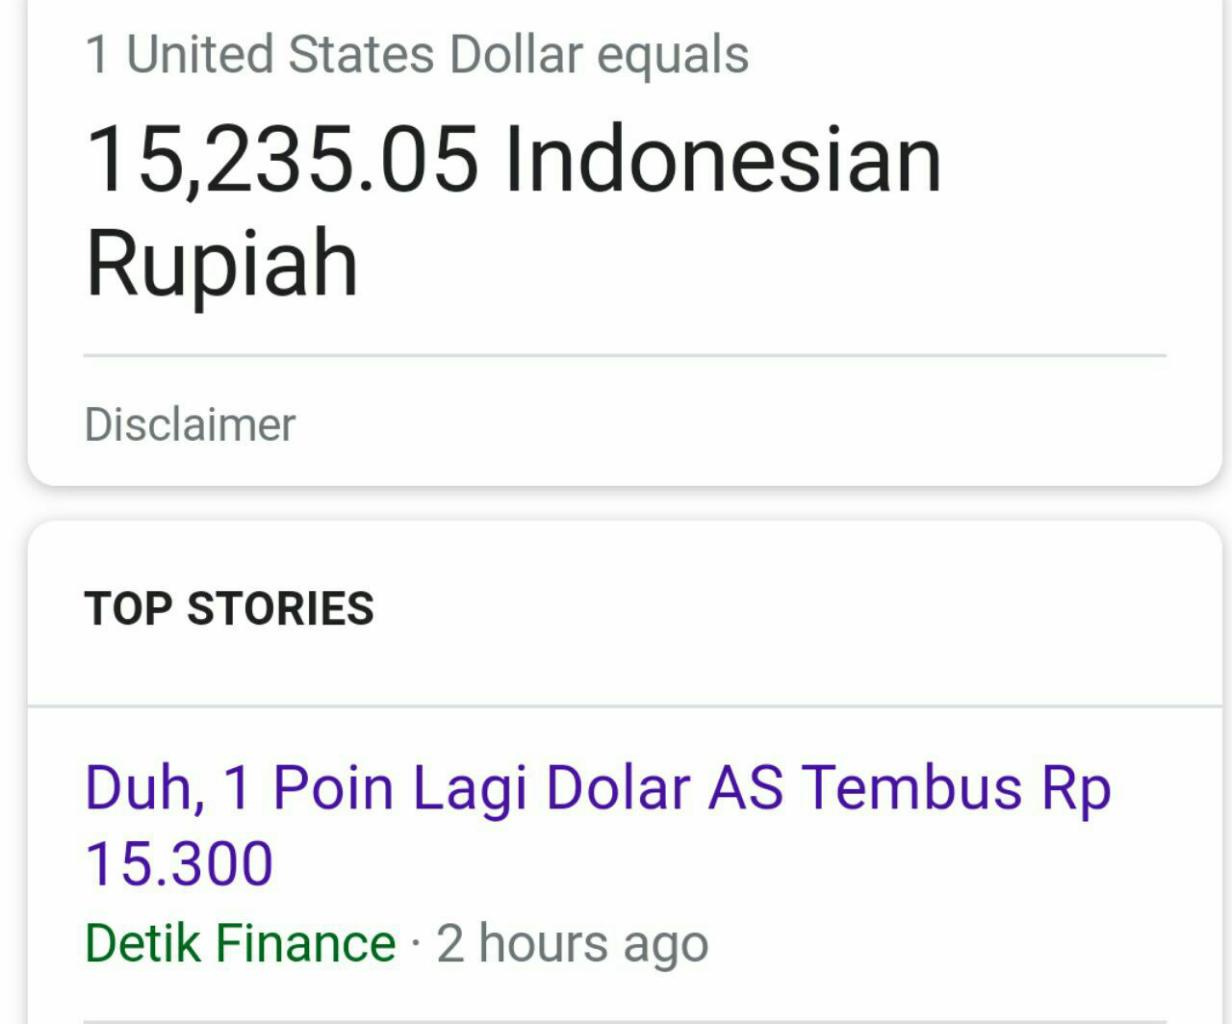 Duh, 1 Poin Lagi Dolar AS Tembus Rp 15.300